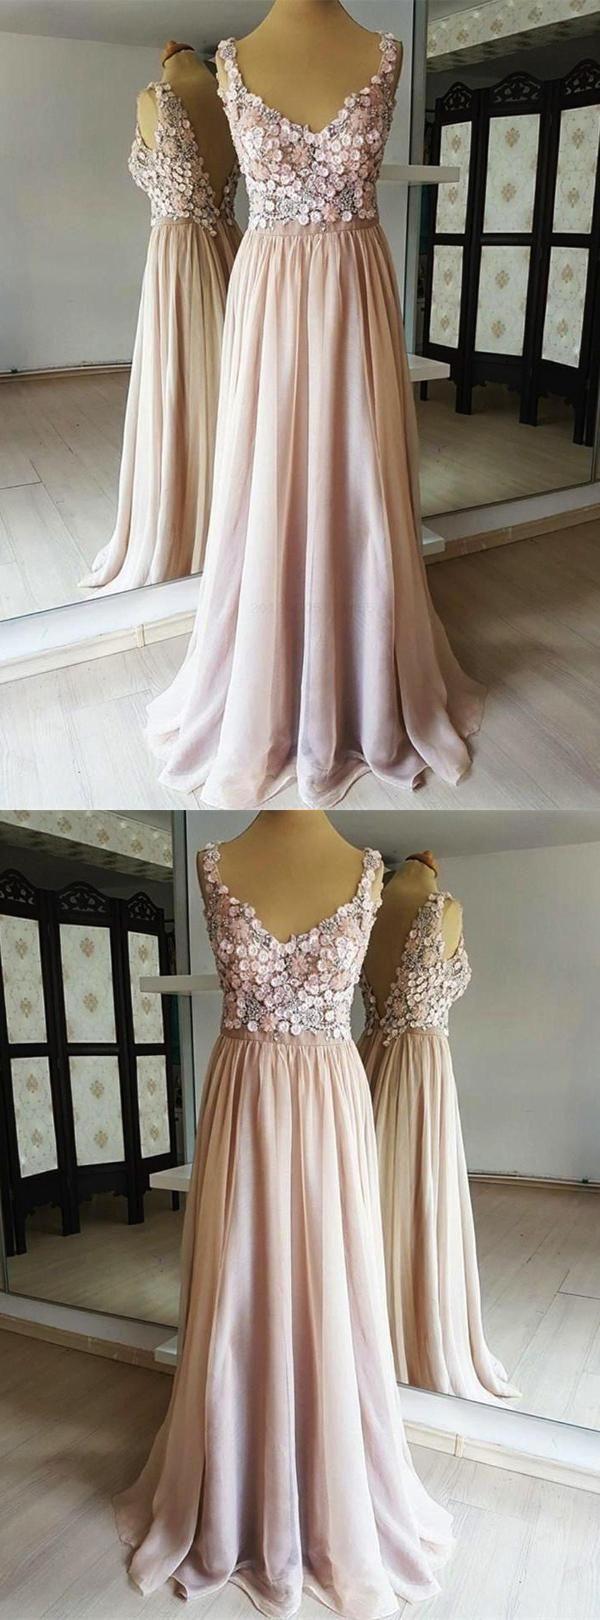 Hot sale feminine champagne open back lace chiffon in prom